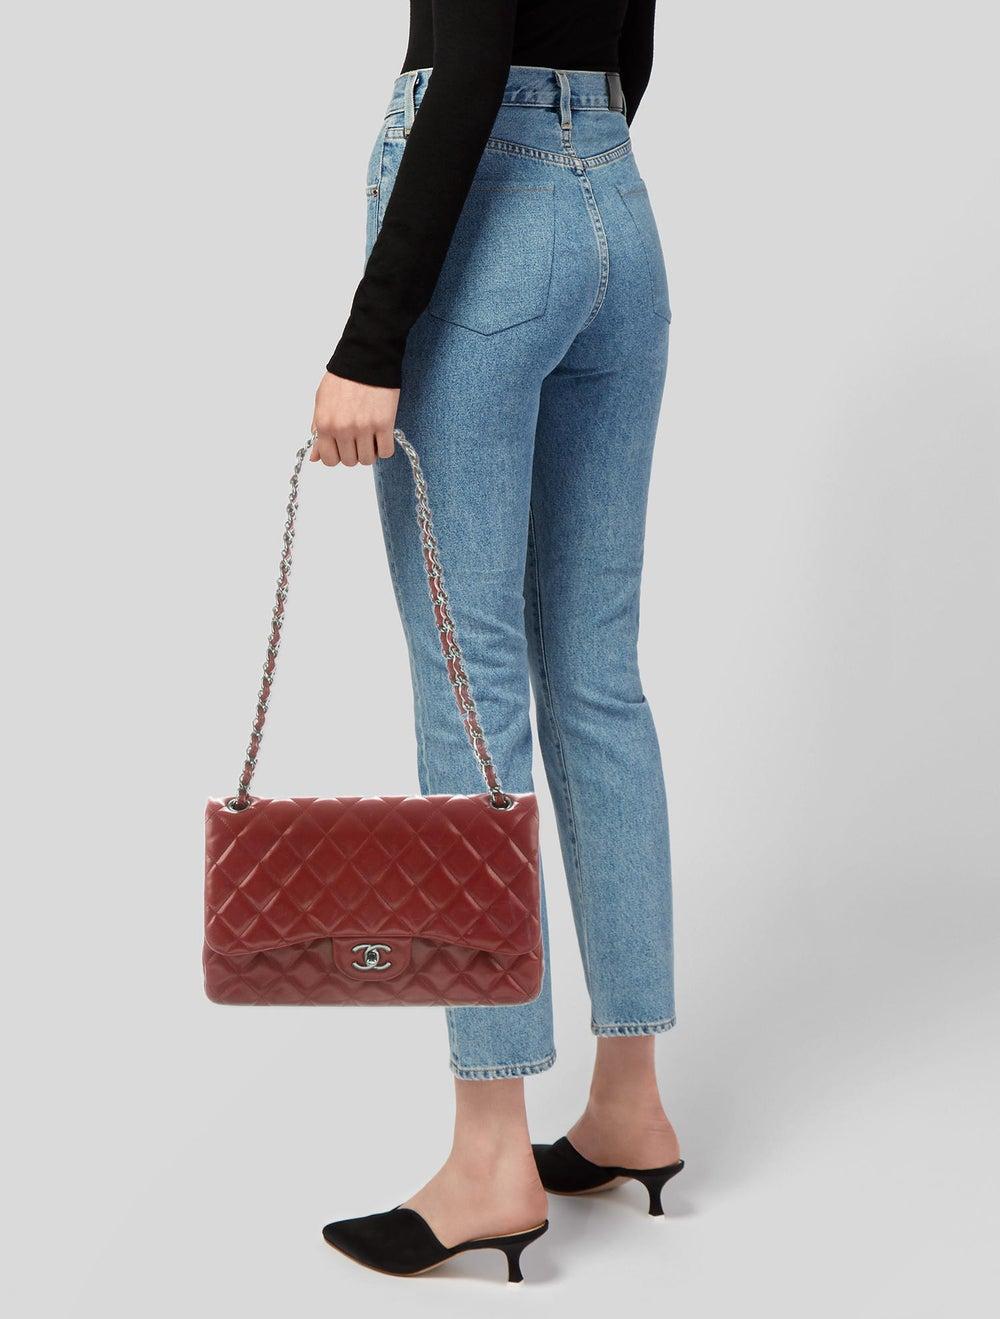 Chanel Jumbo Classic Double Flap Bag silver - image 2